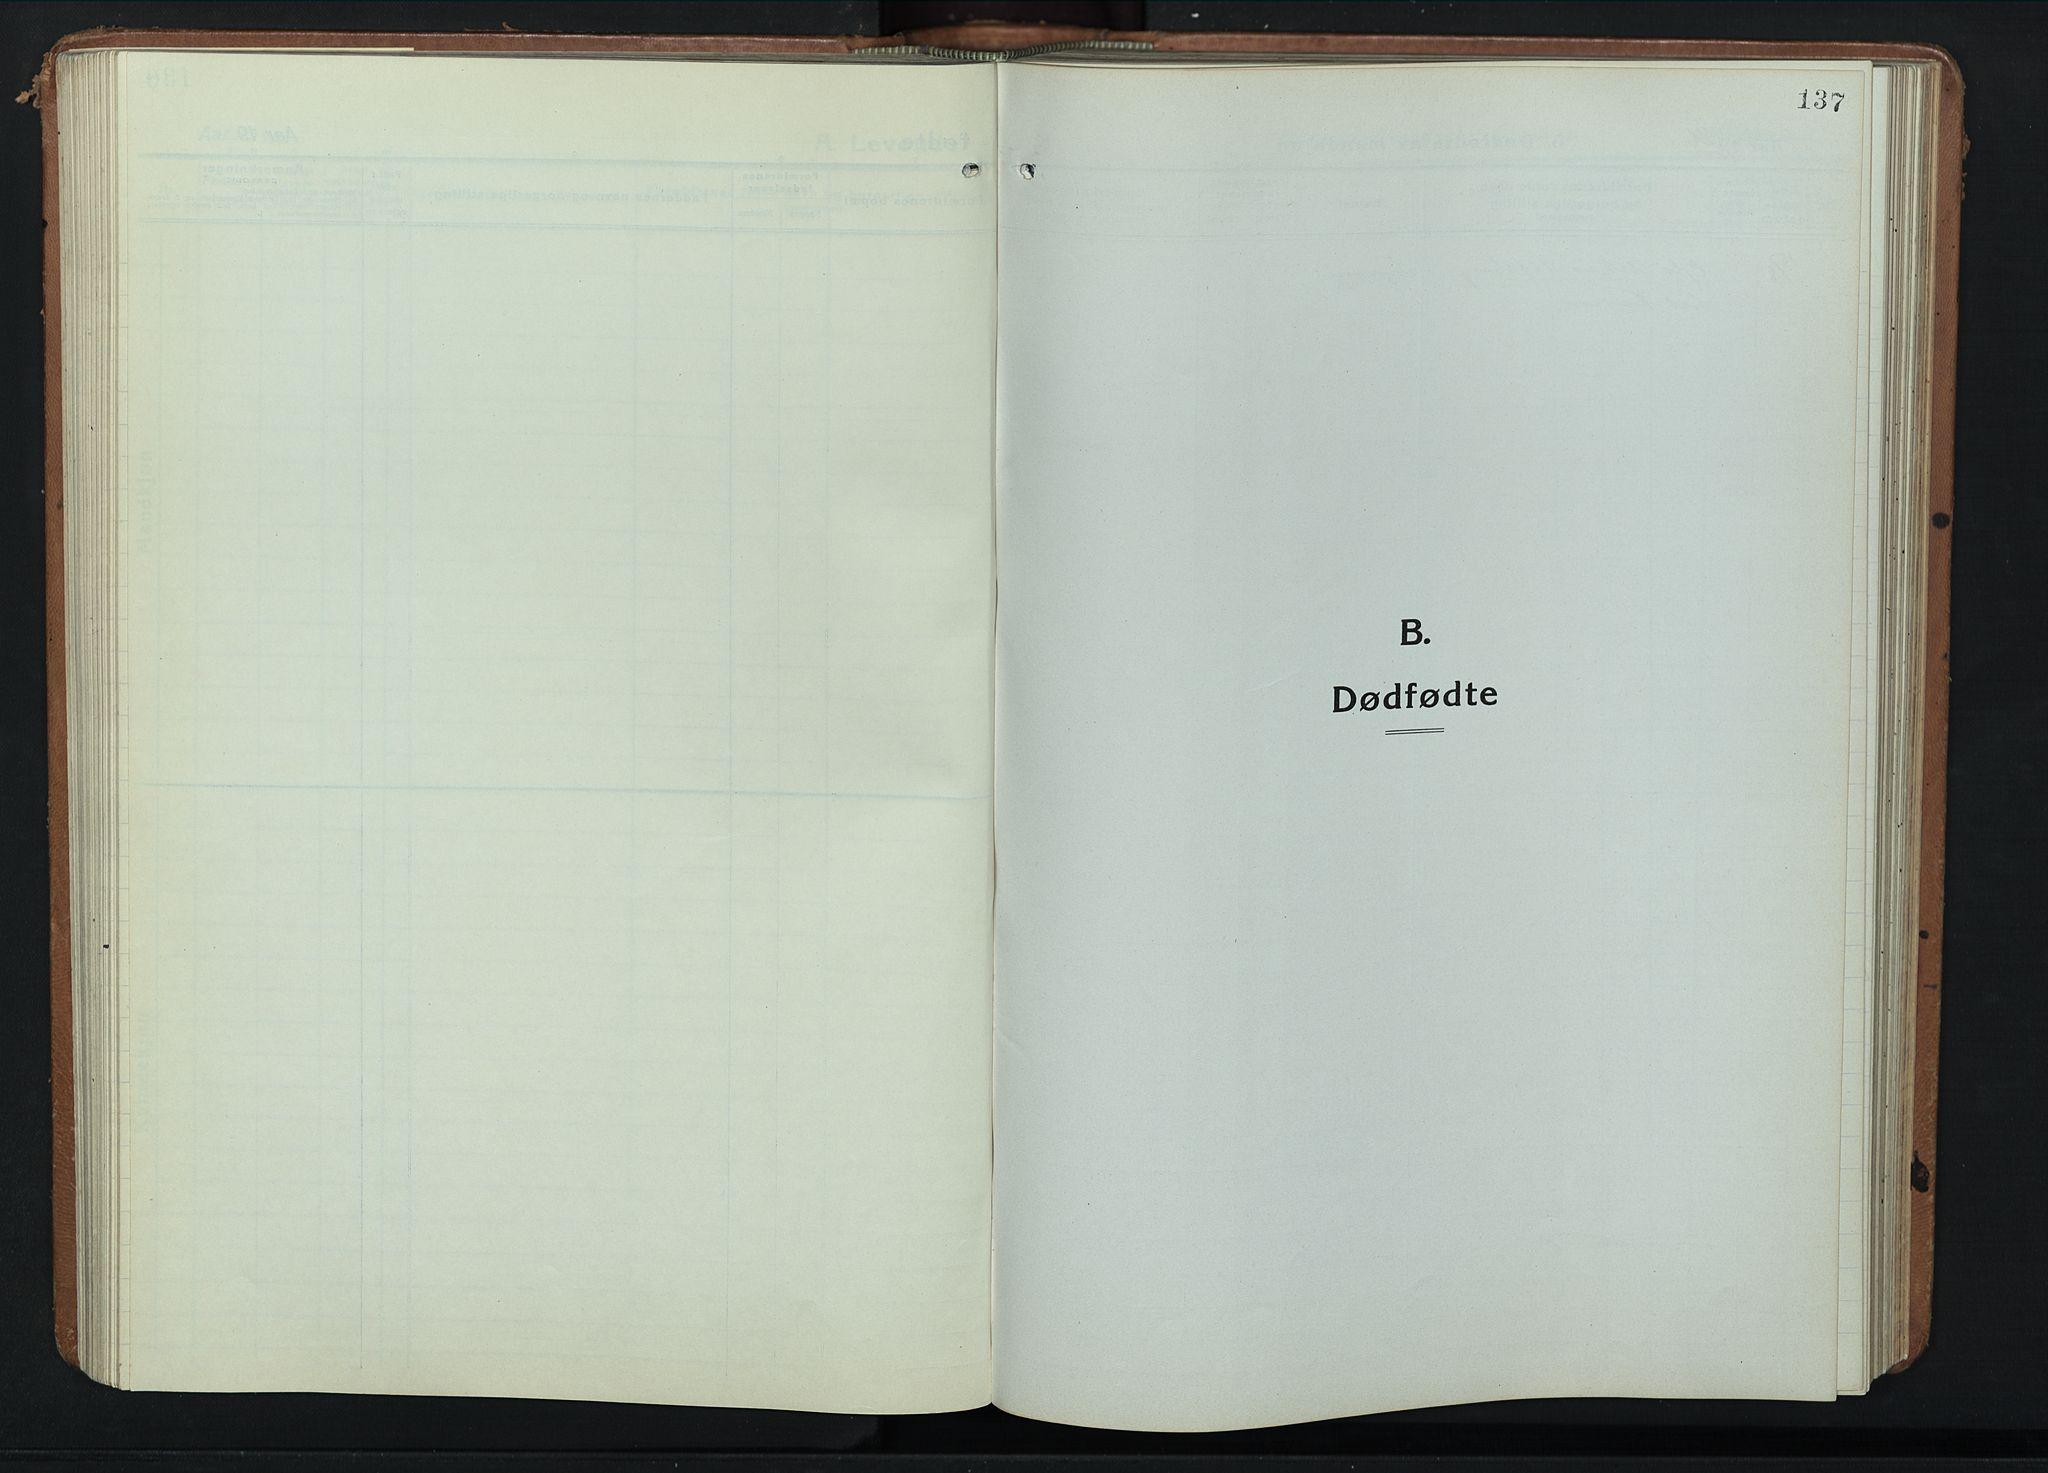 SAH, Fåberg prestekontor, Klokkerbok nr. 14, 1922-1946, s. 137